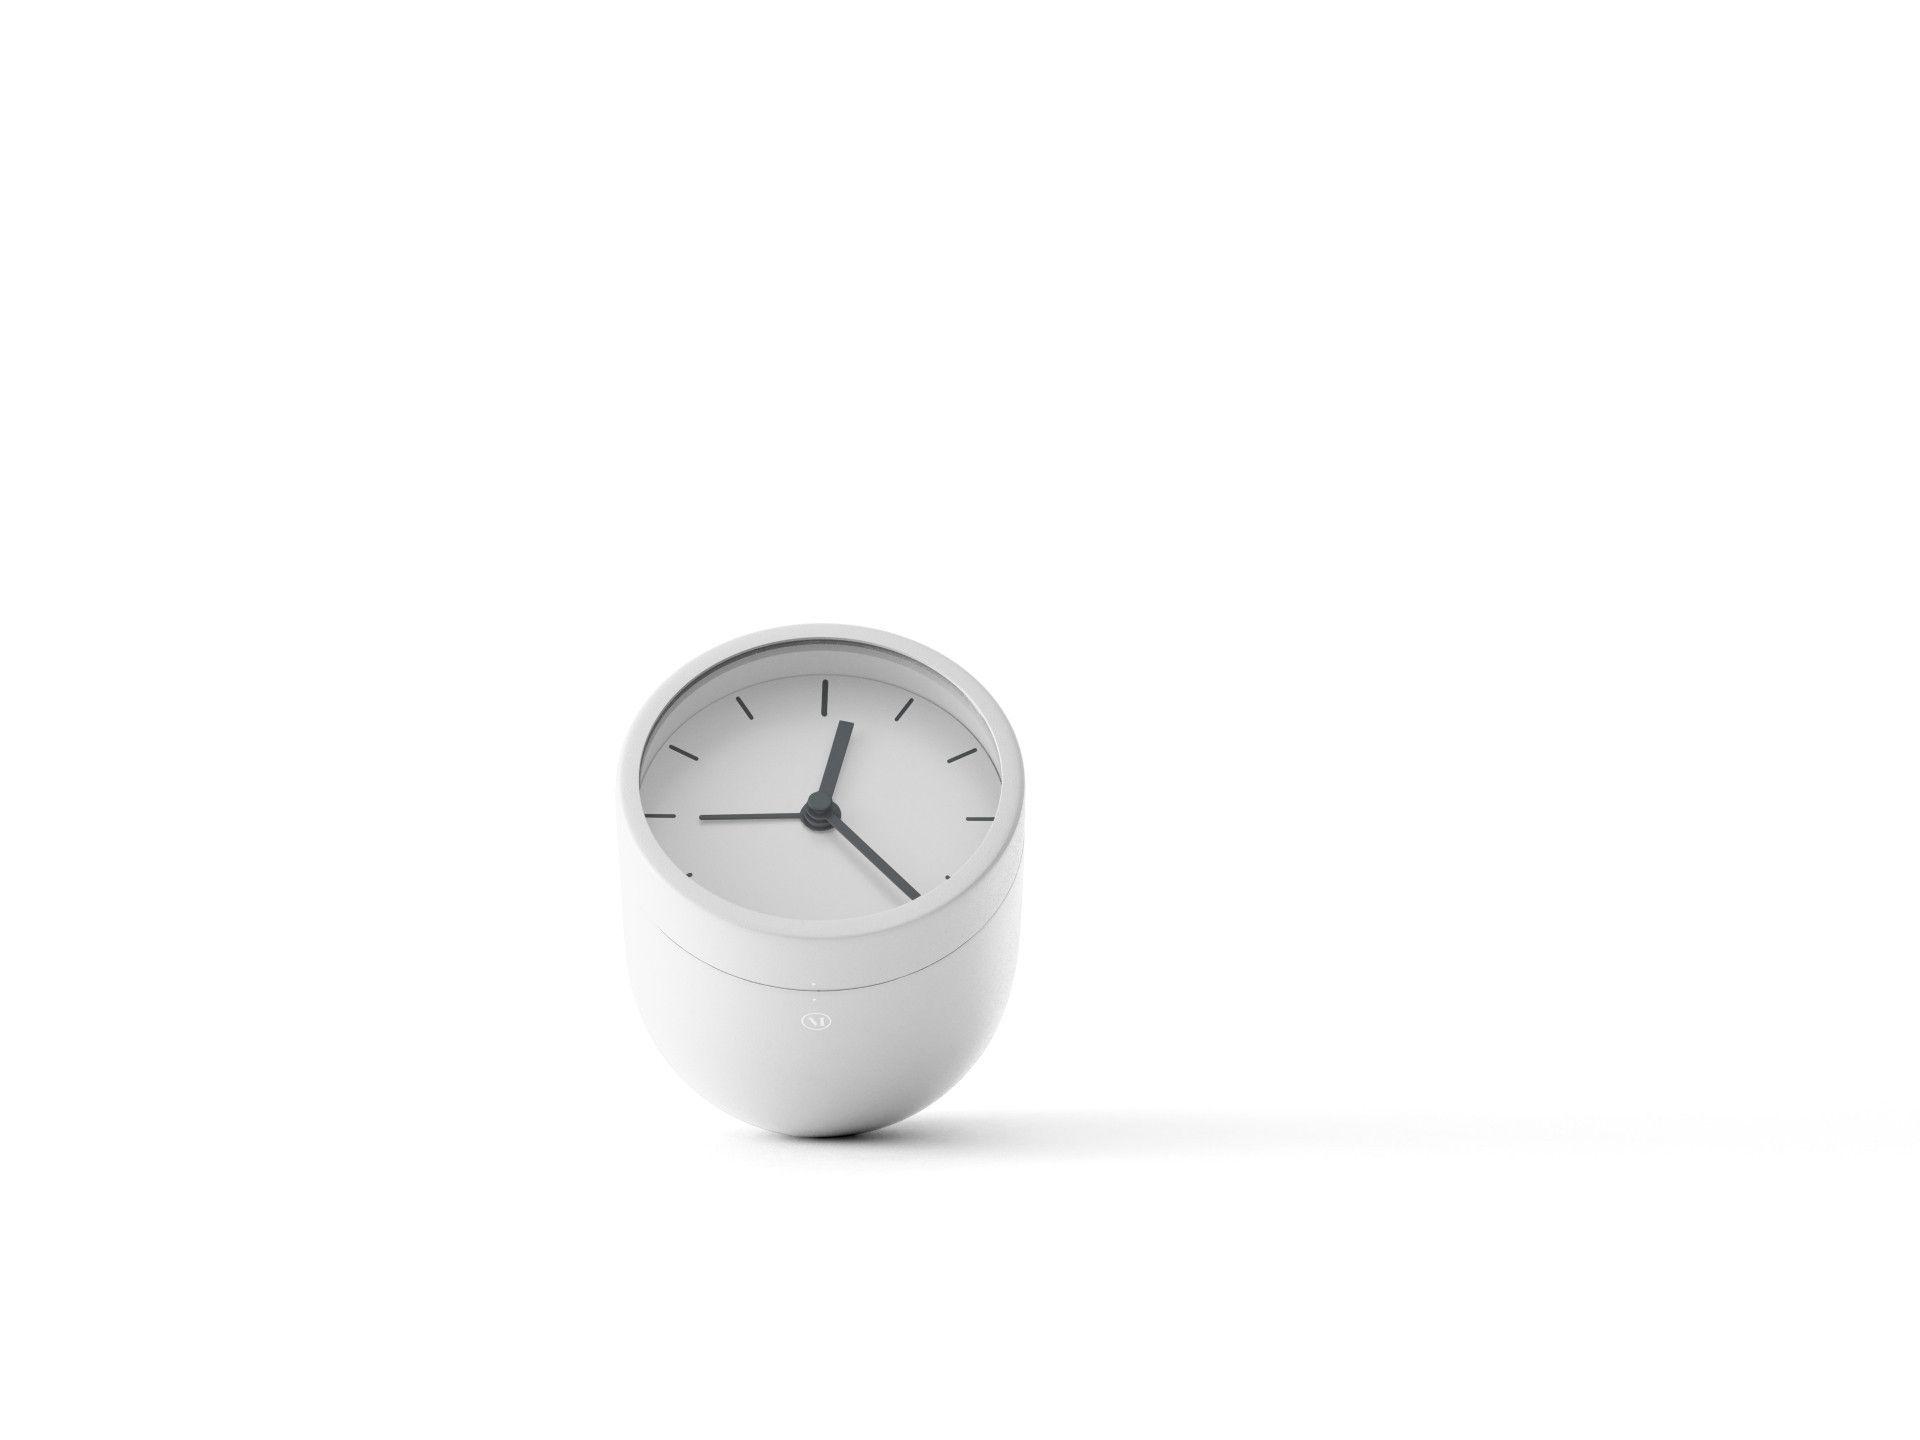 Tumbler Alarm Clock In White Design By Menu Clock Alarm Clock White Design